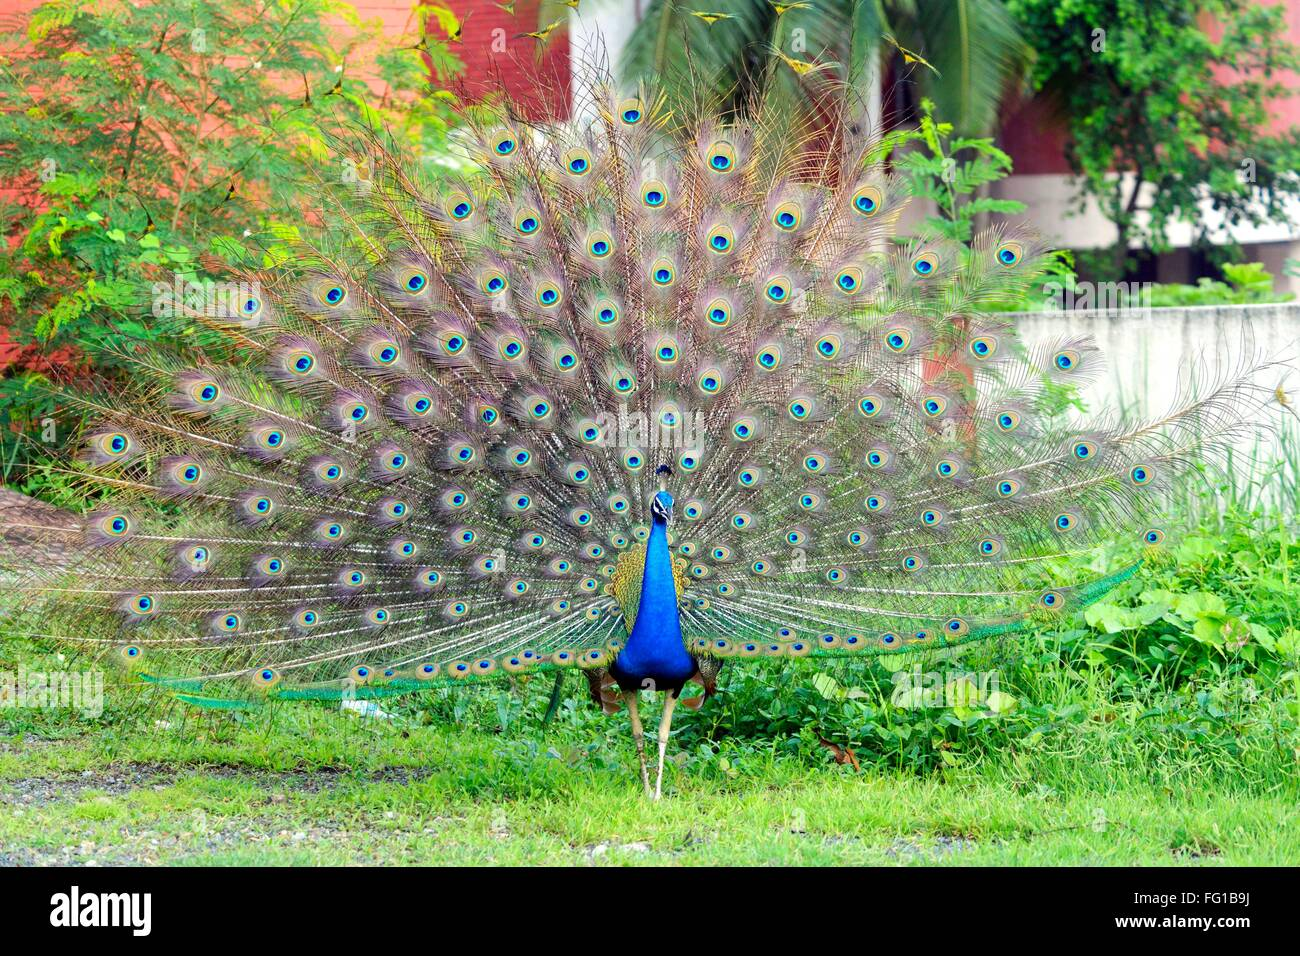 Peacock Peafowl Surat Gujarat India Asia Sept 2010 Foto de stock